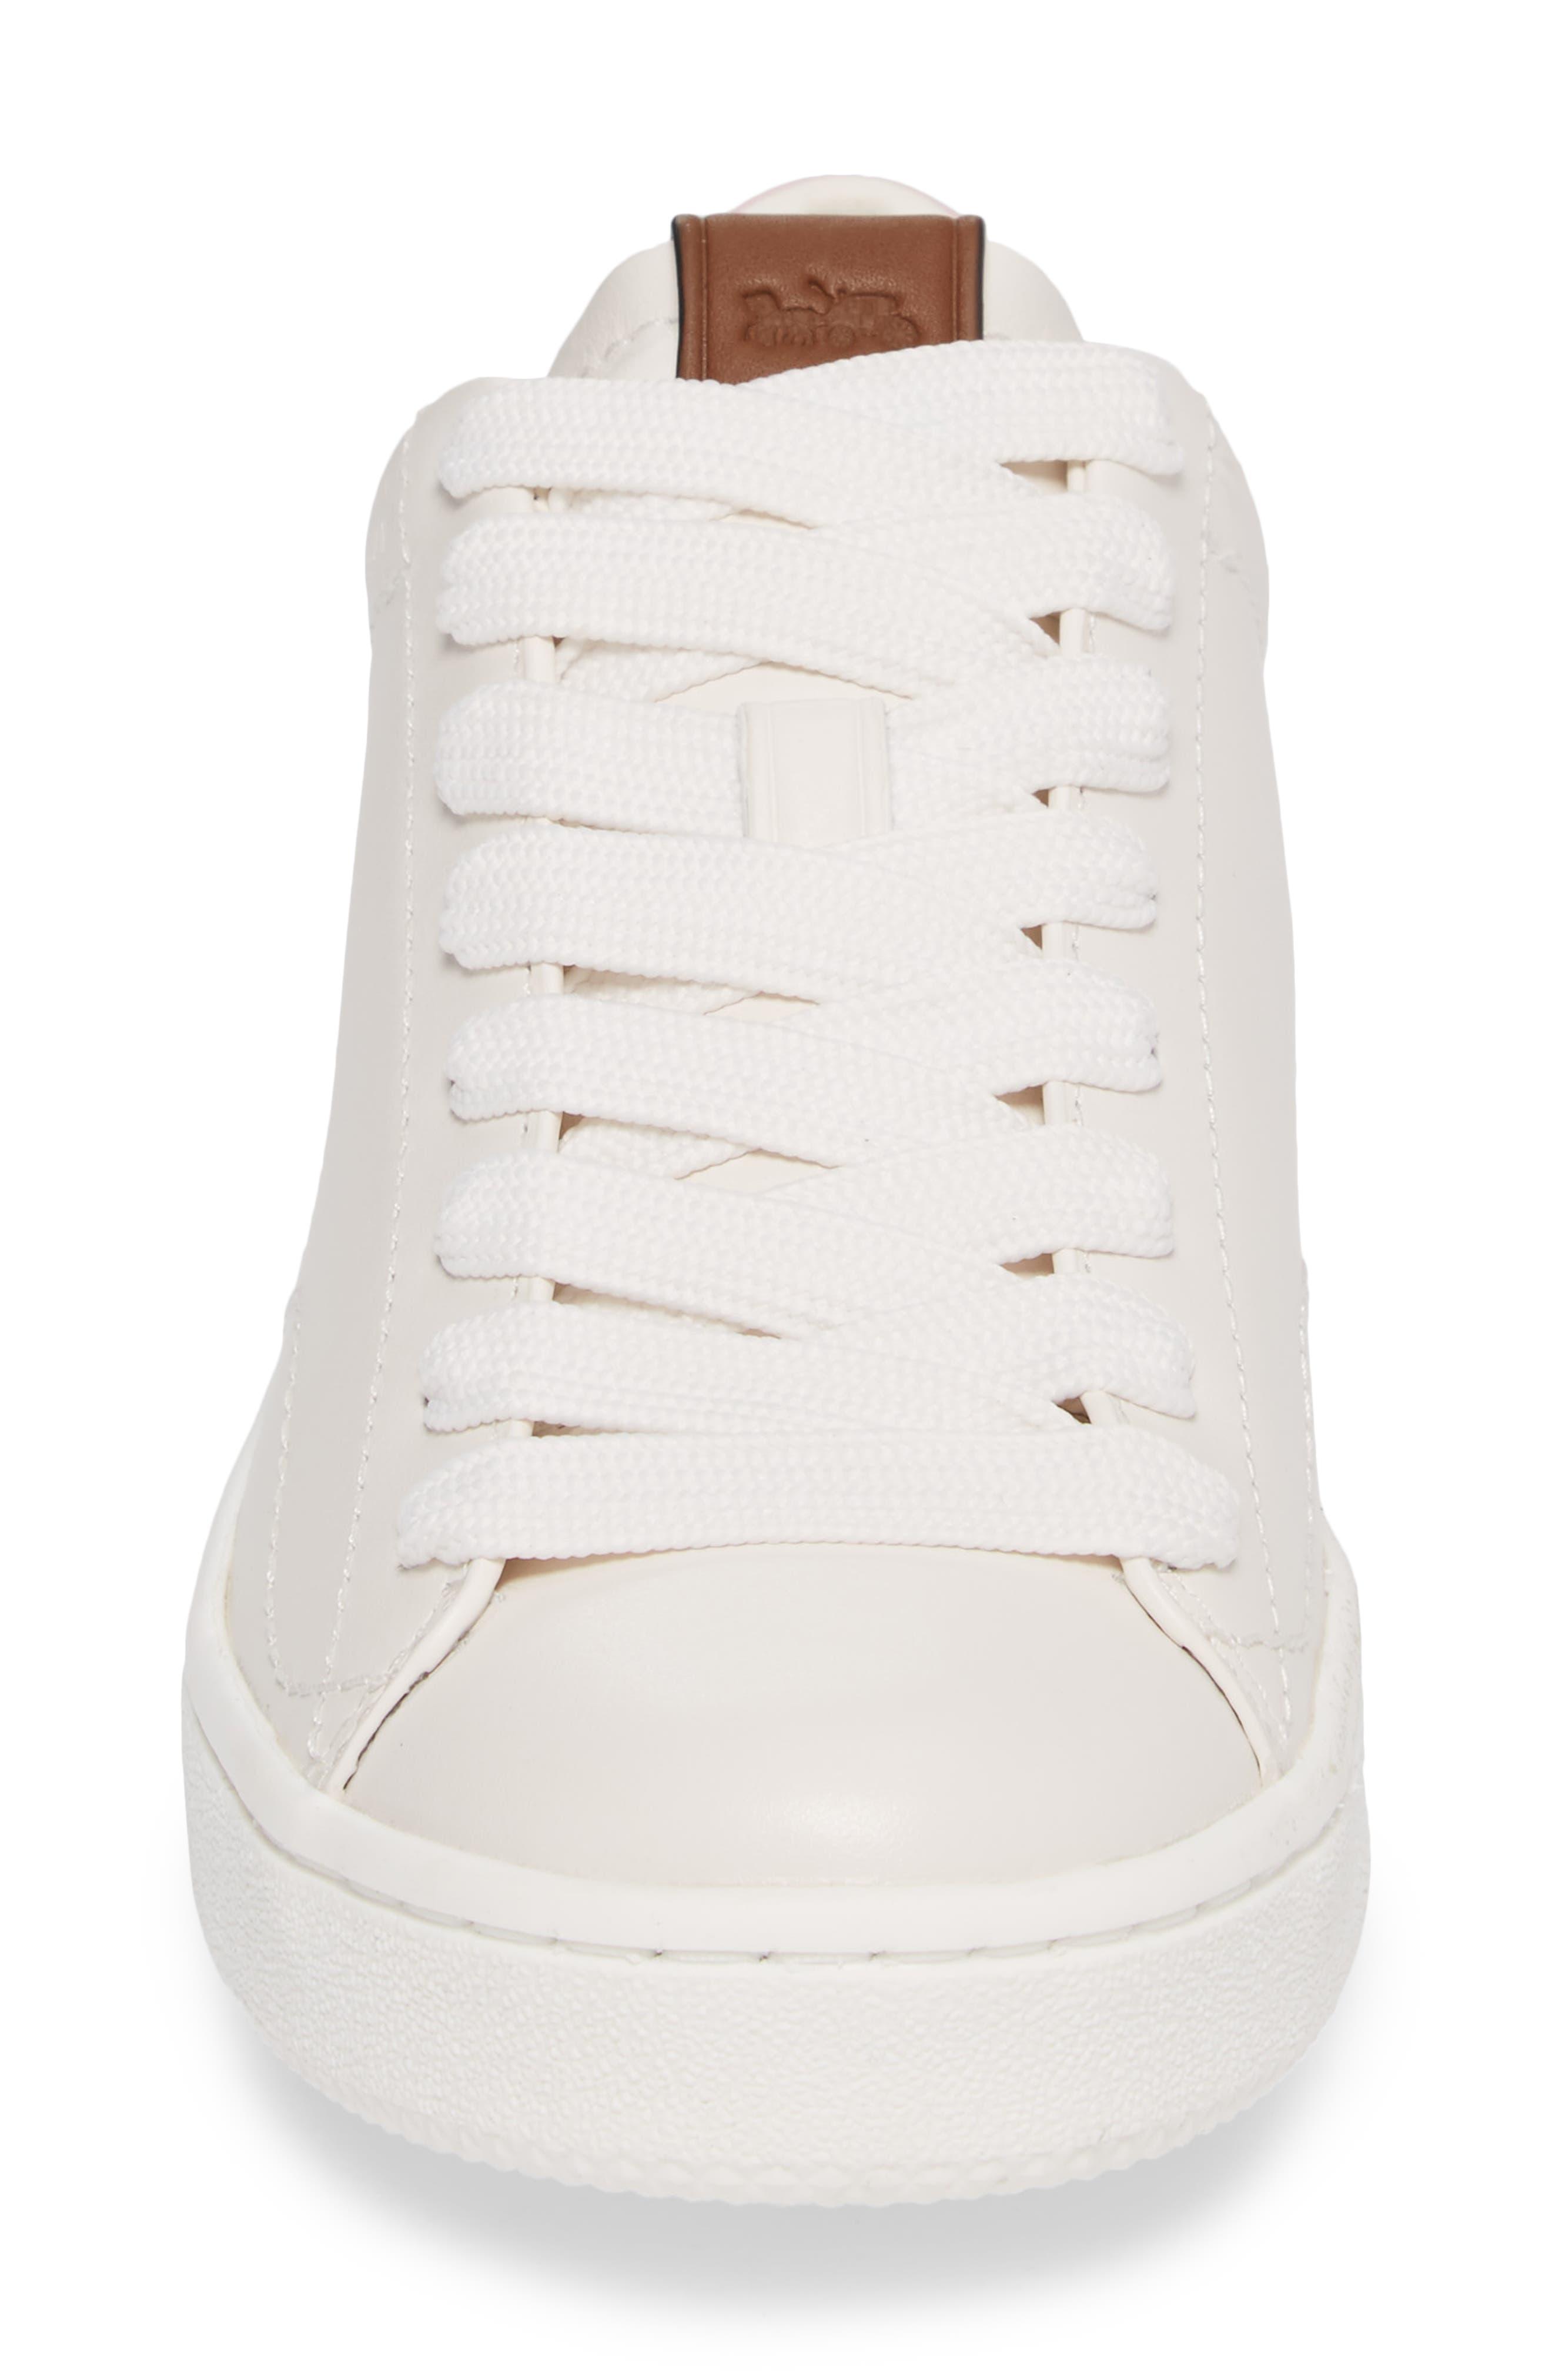 COACH, Sneaker, Alternate thumbnail 4, color, WHITE/ PETAL LEATHER